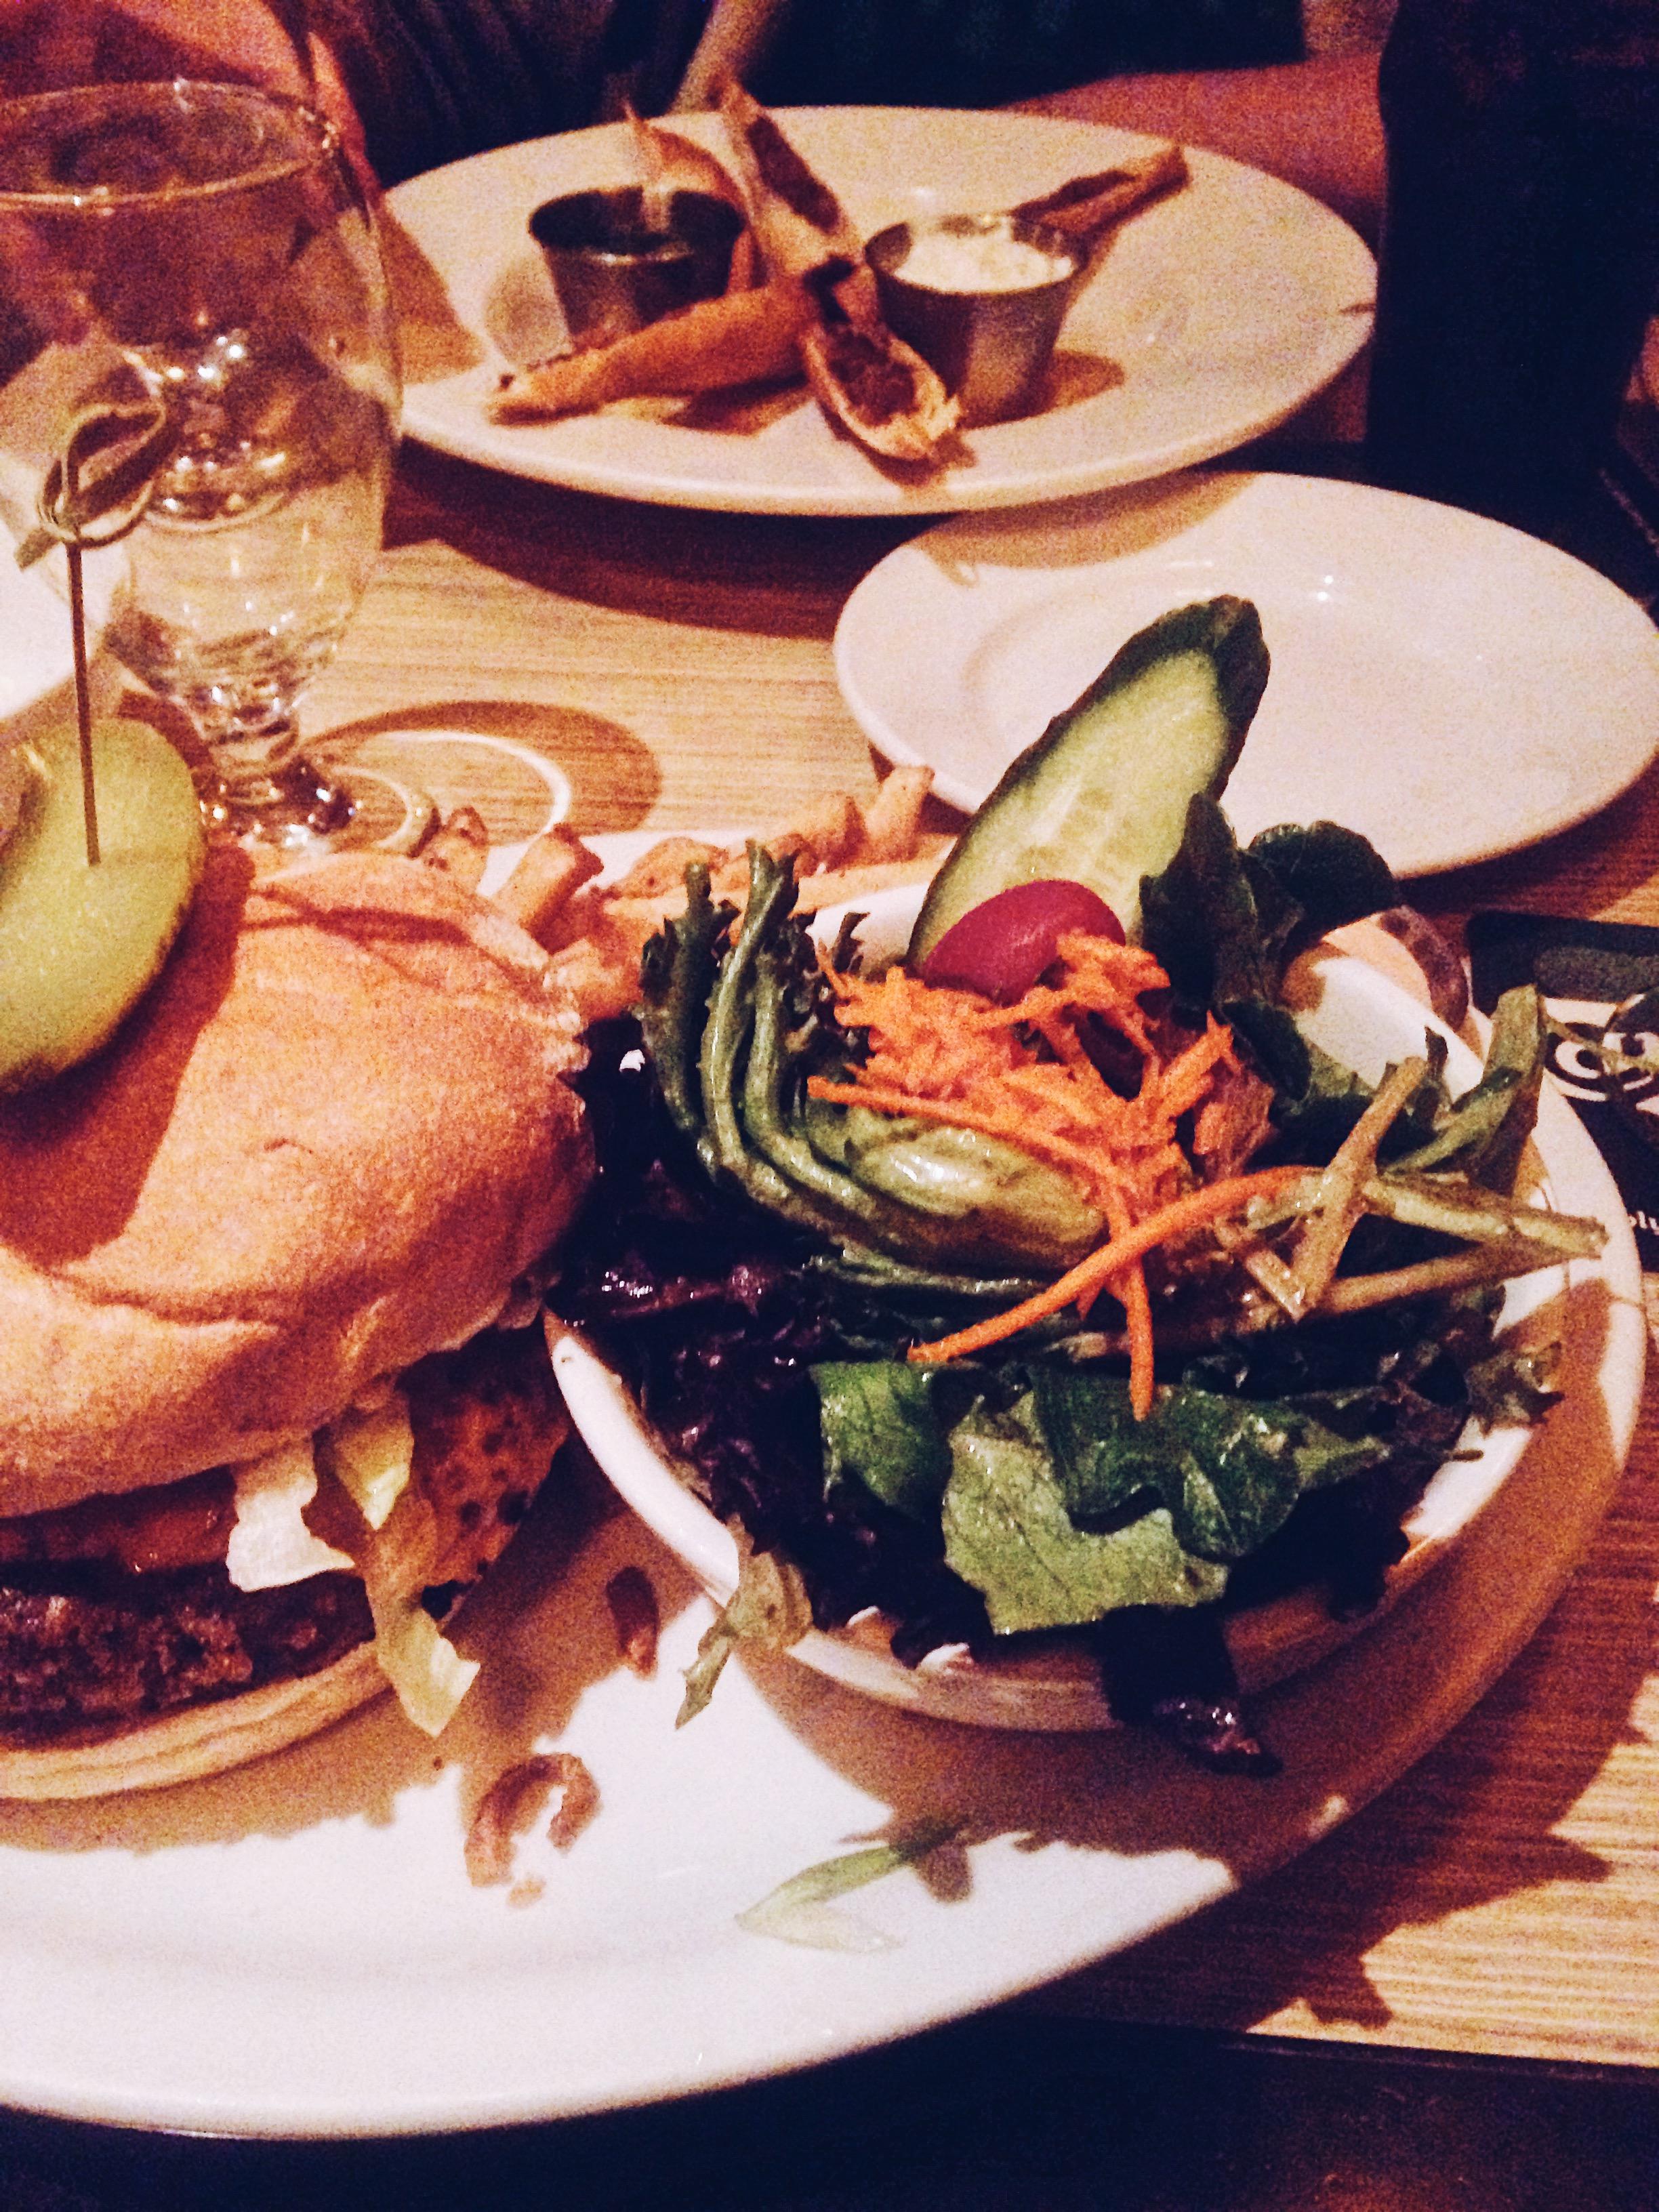 Veggie burgers at Biercraft. Restaurant review. Vancouver. Canada